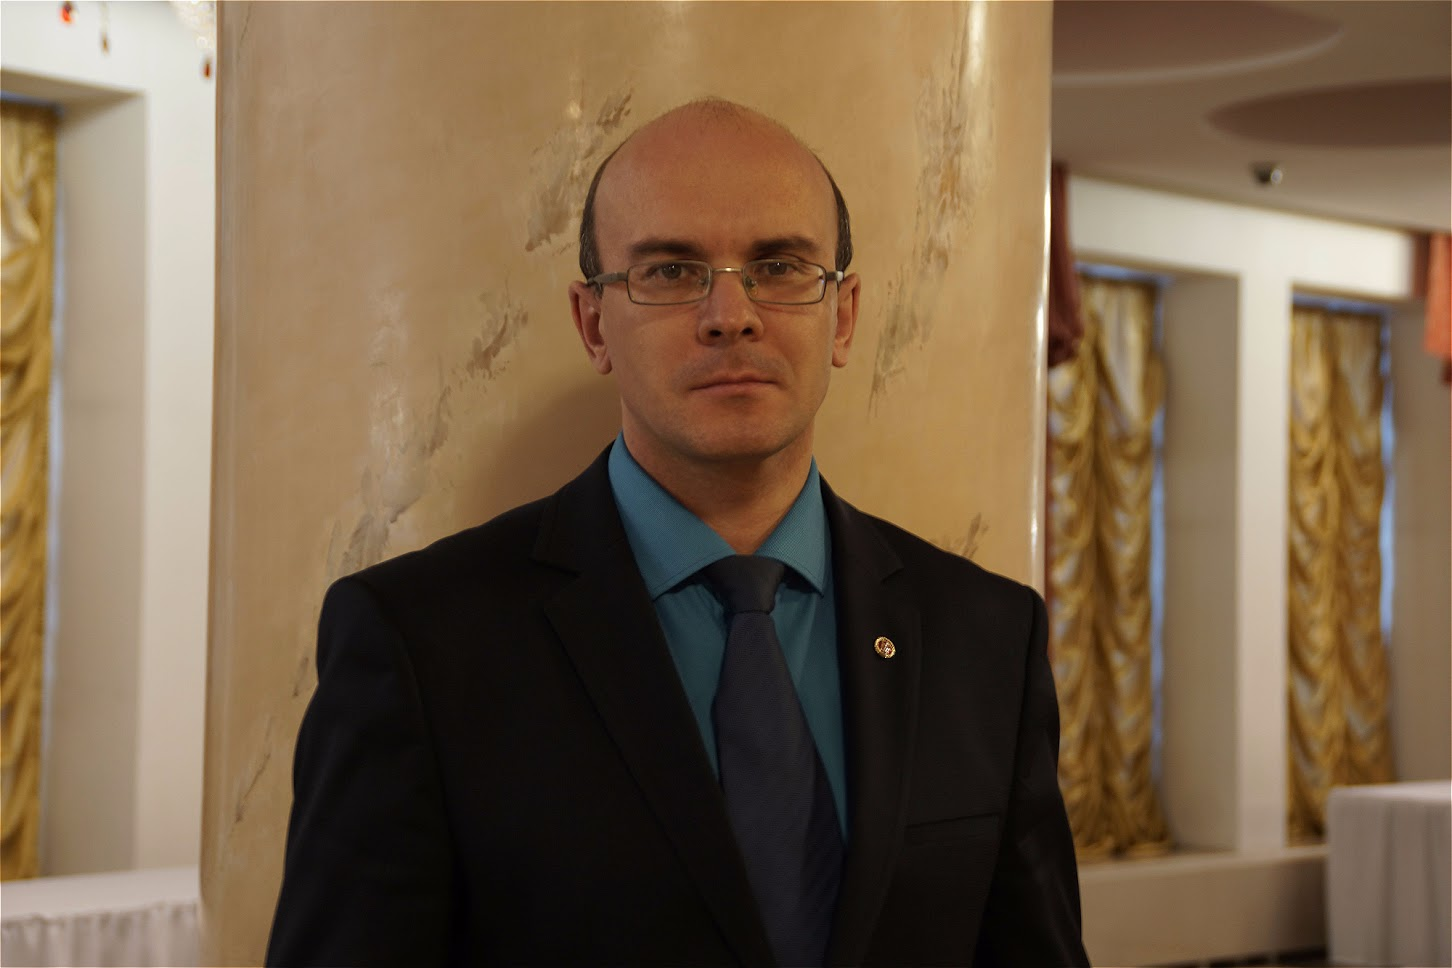 Делегат Съезда Юрий Ладейщиков: Направление развития обозначил президент